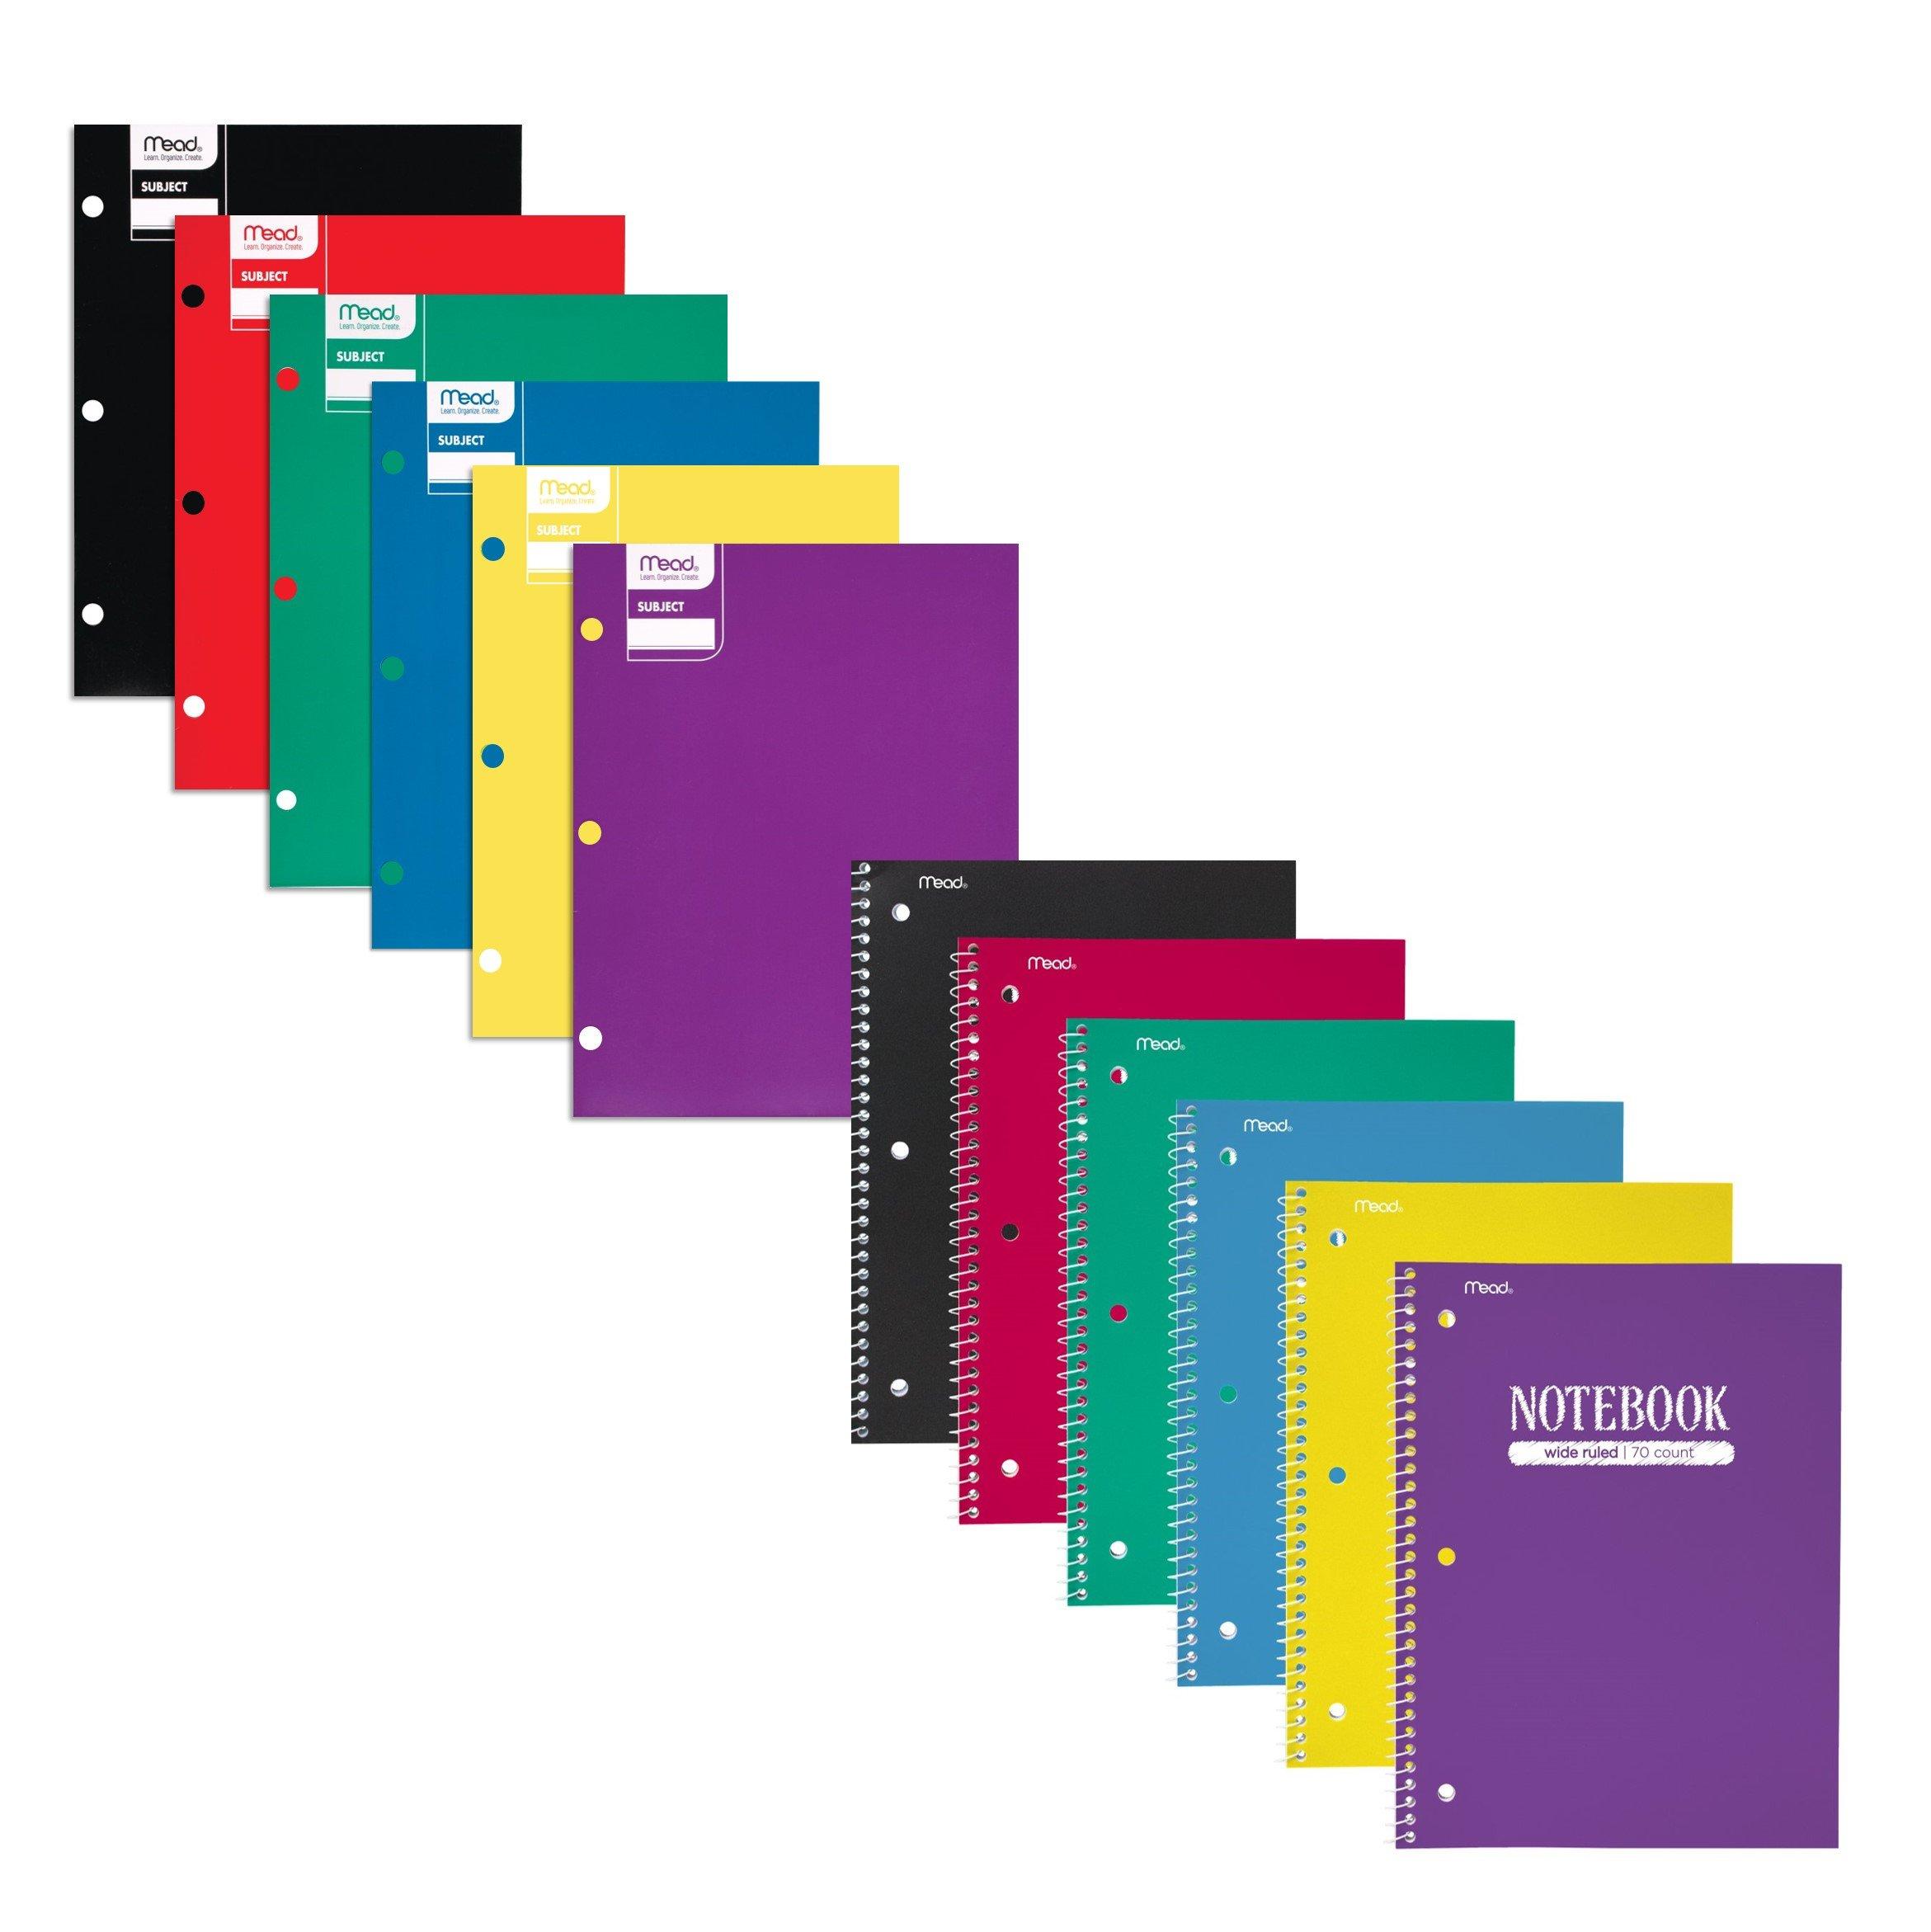 Mead School Supplies 12 Pack: 6 Spiral Notebooks, 6 Pocket Folders, Purple, Green, Yellow, Red, Black, Blue, 12 Pack (38535)